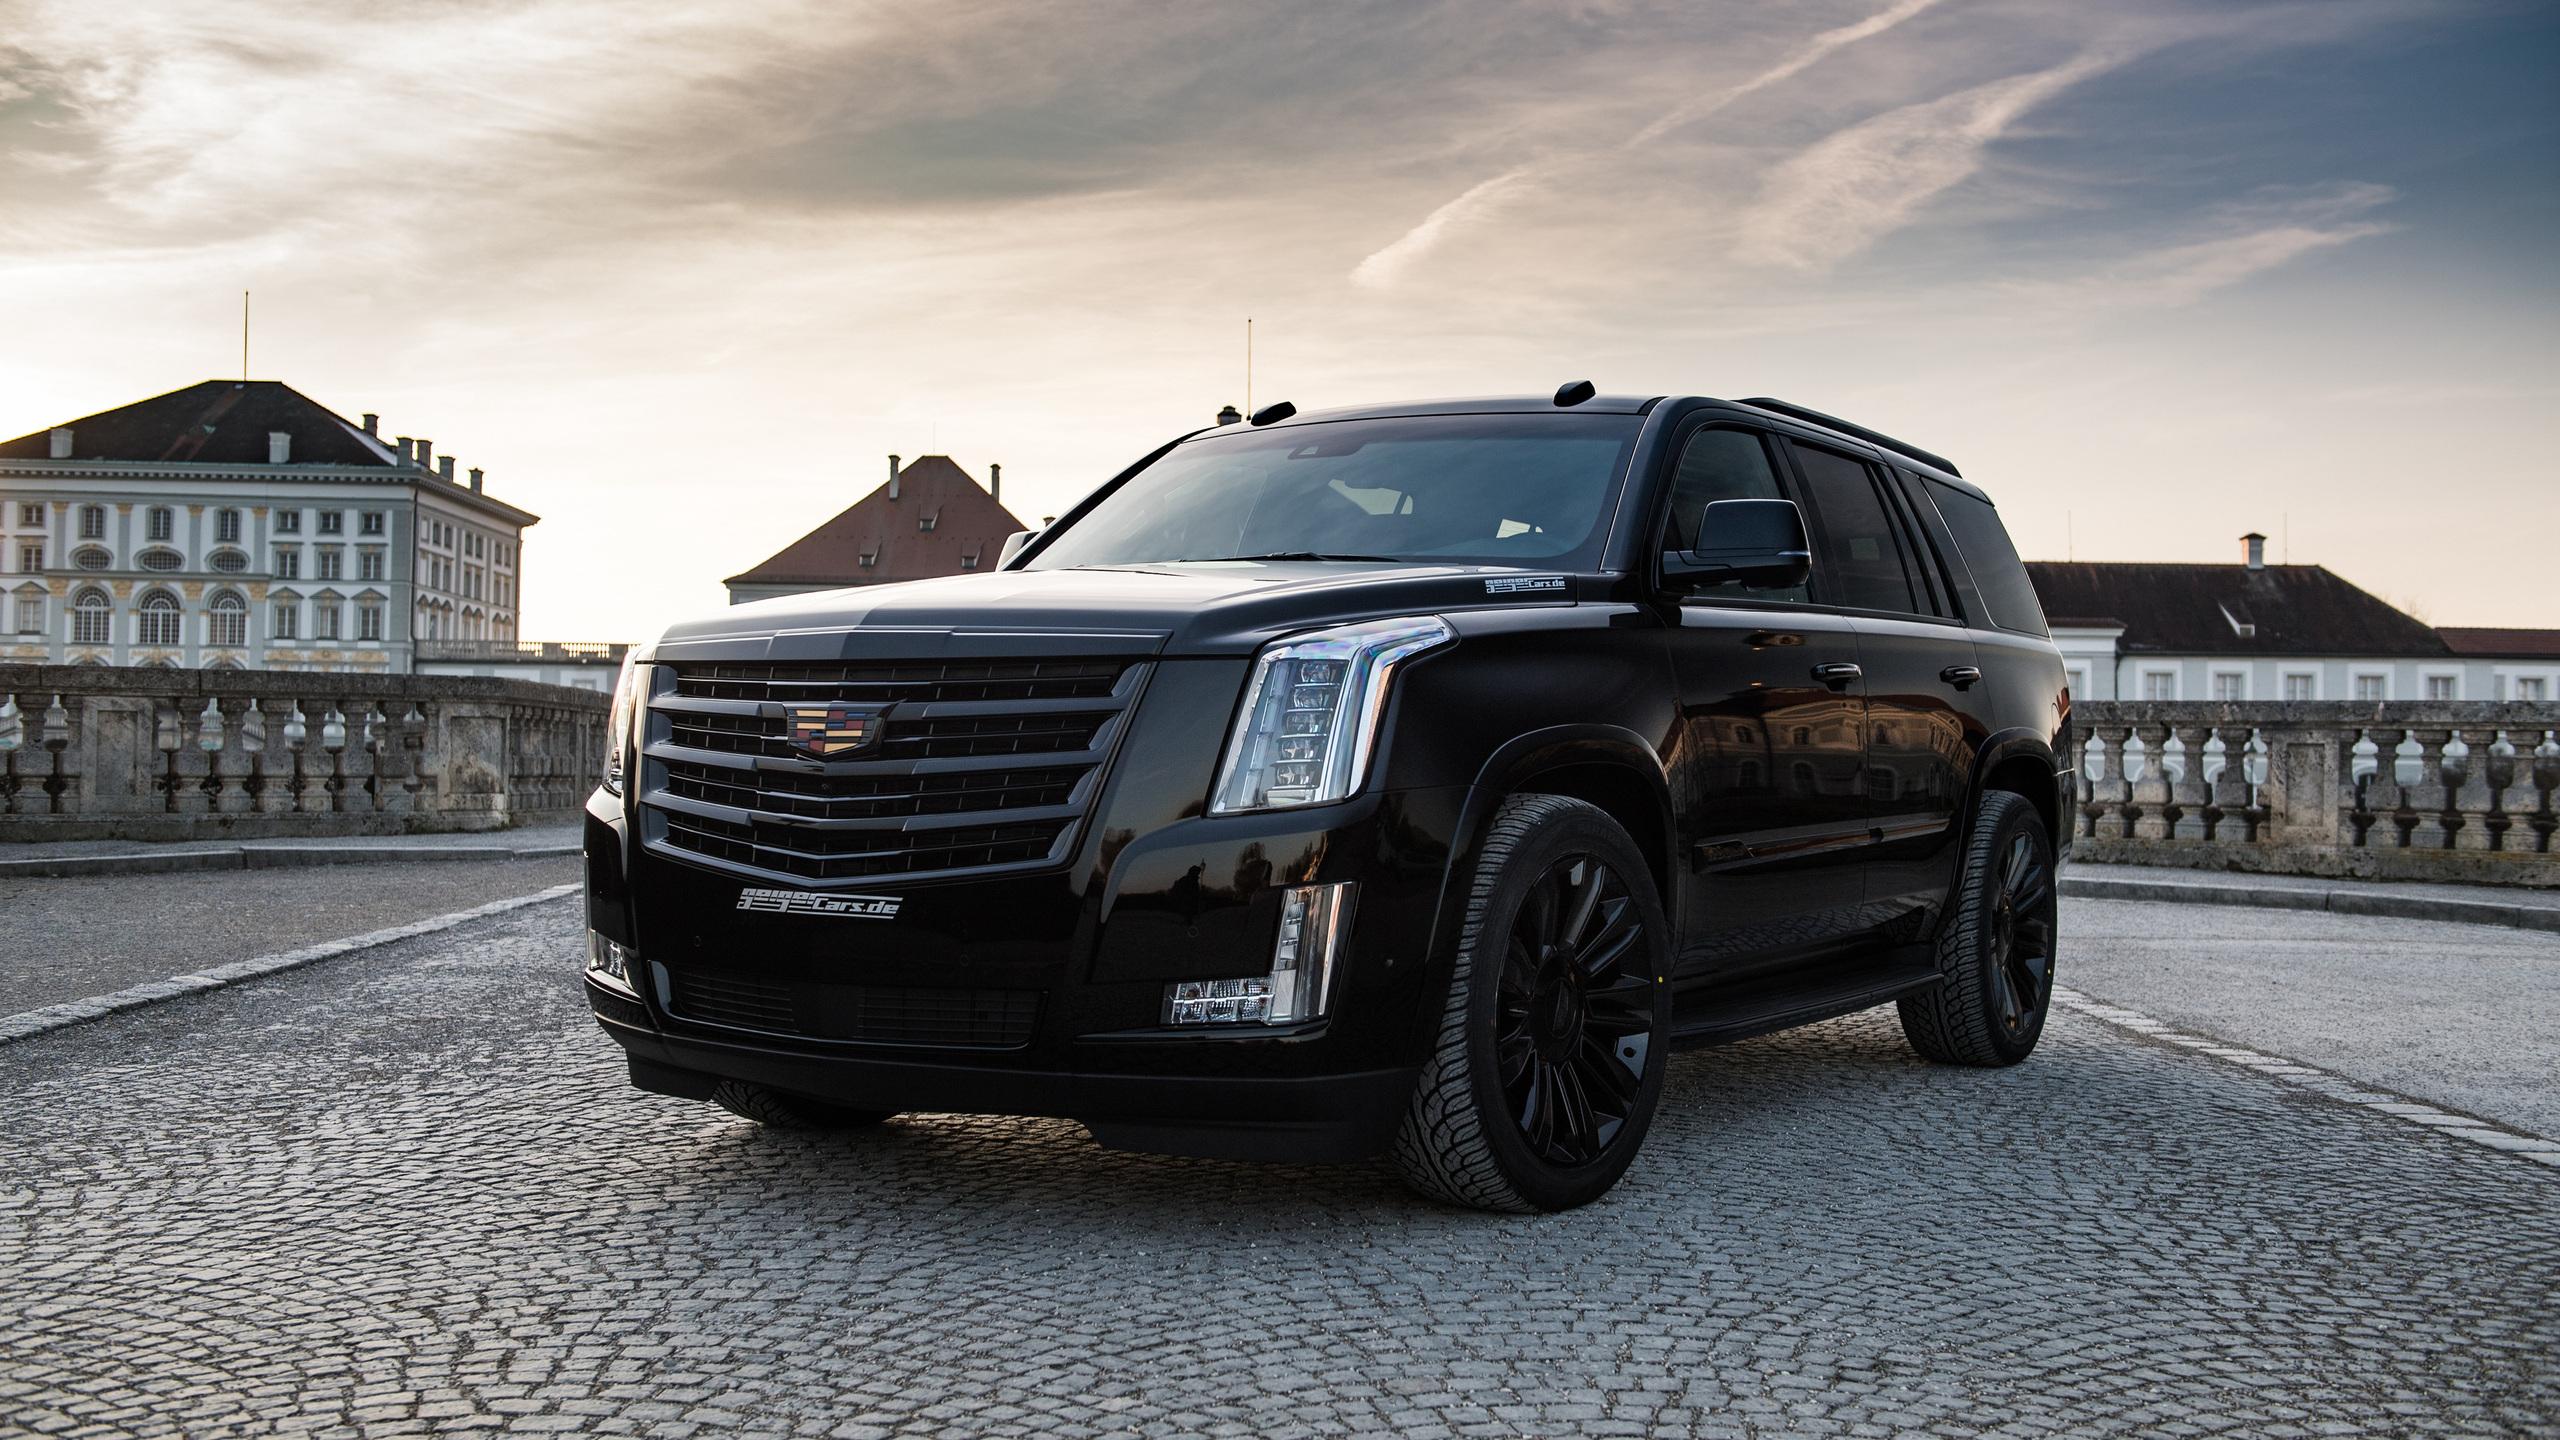 2560x1440 Geiger Cadillac Escalade Black Edition 2018 ...